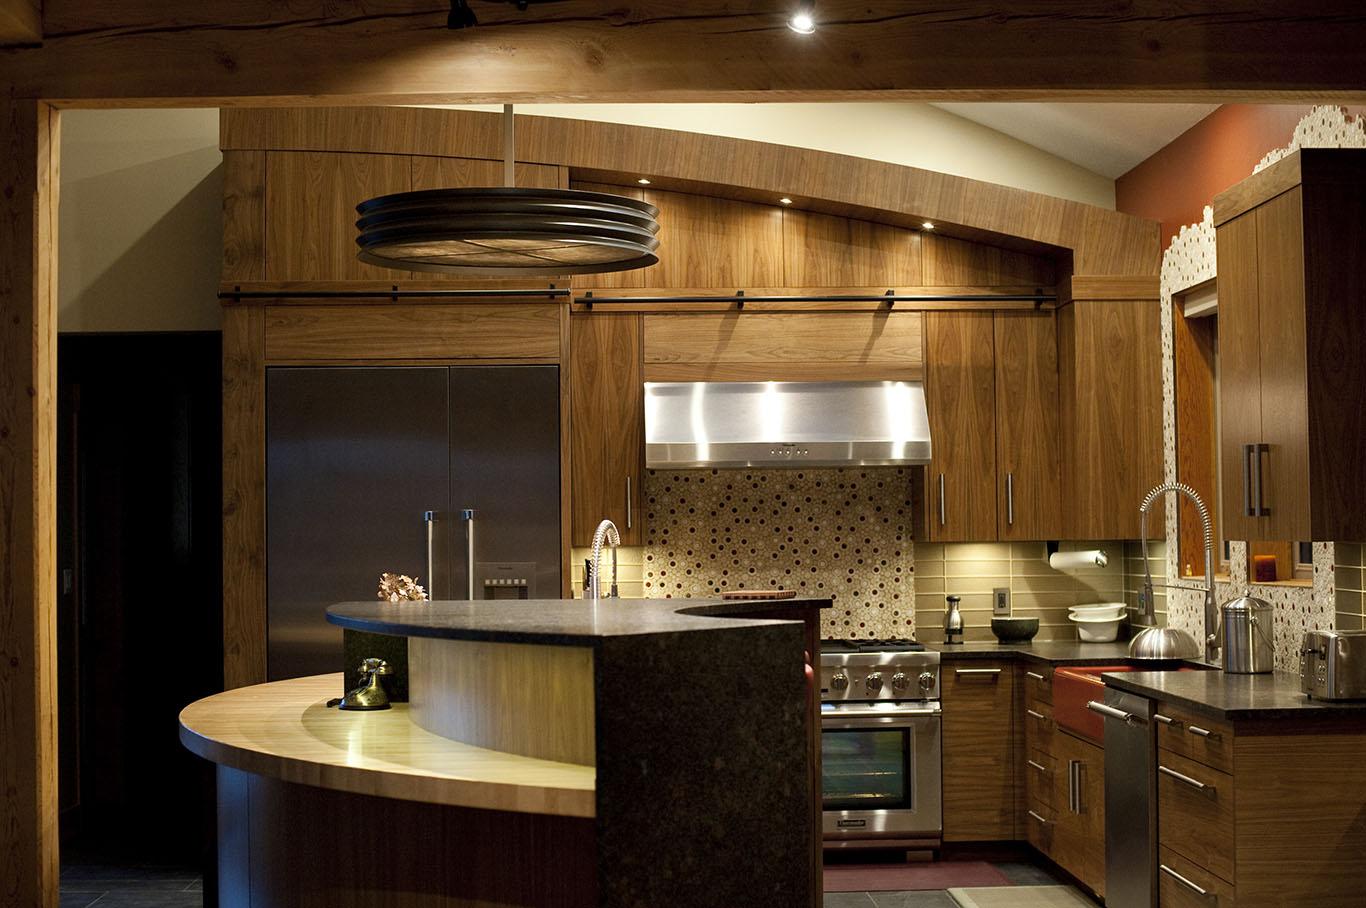 Exquisite Cabinetry